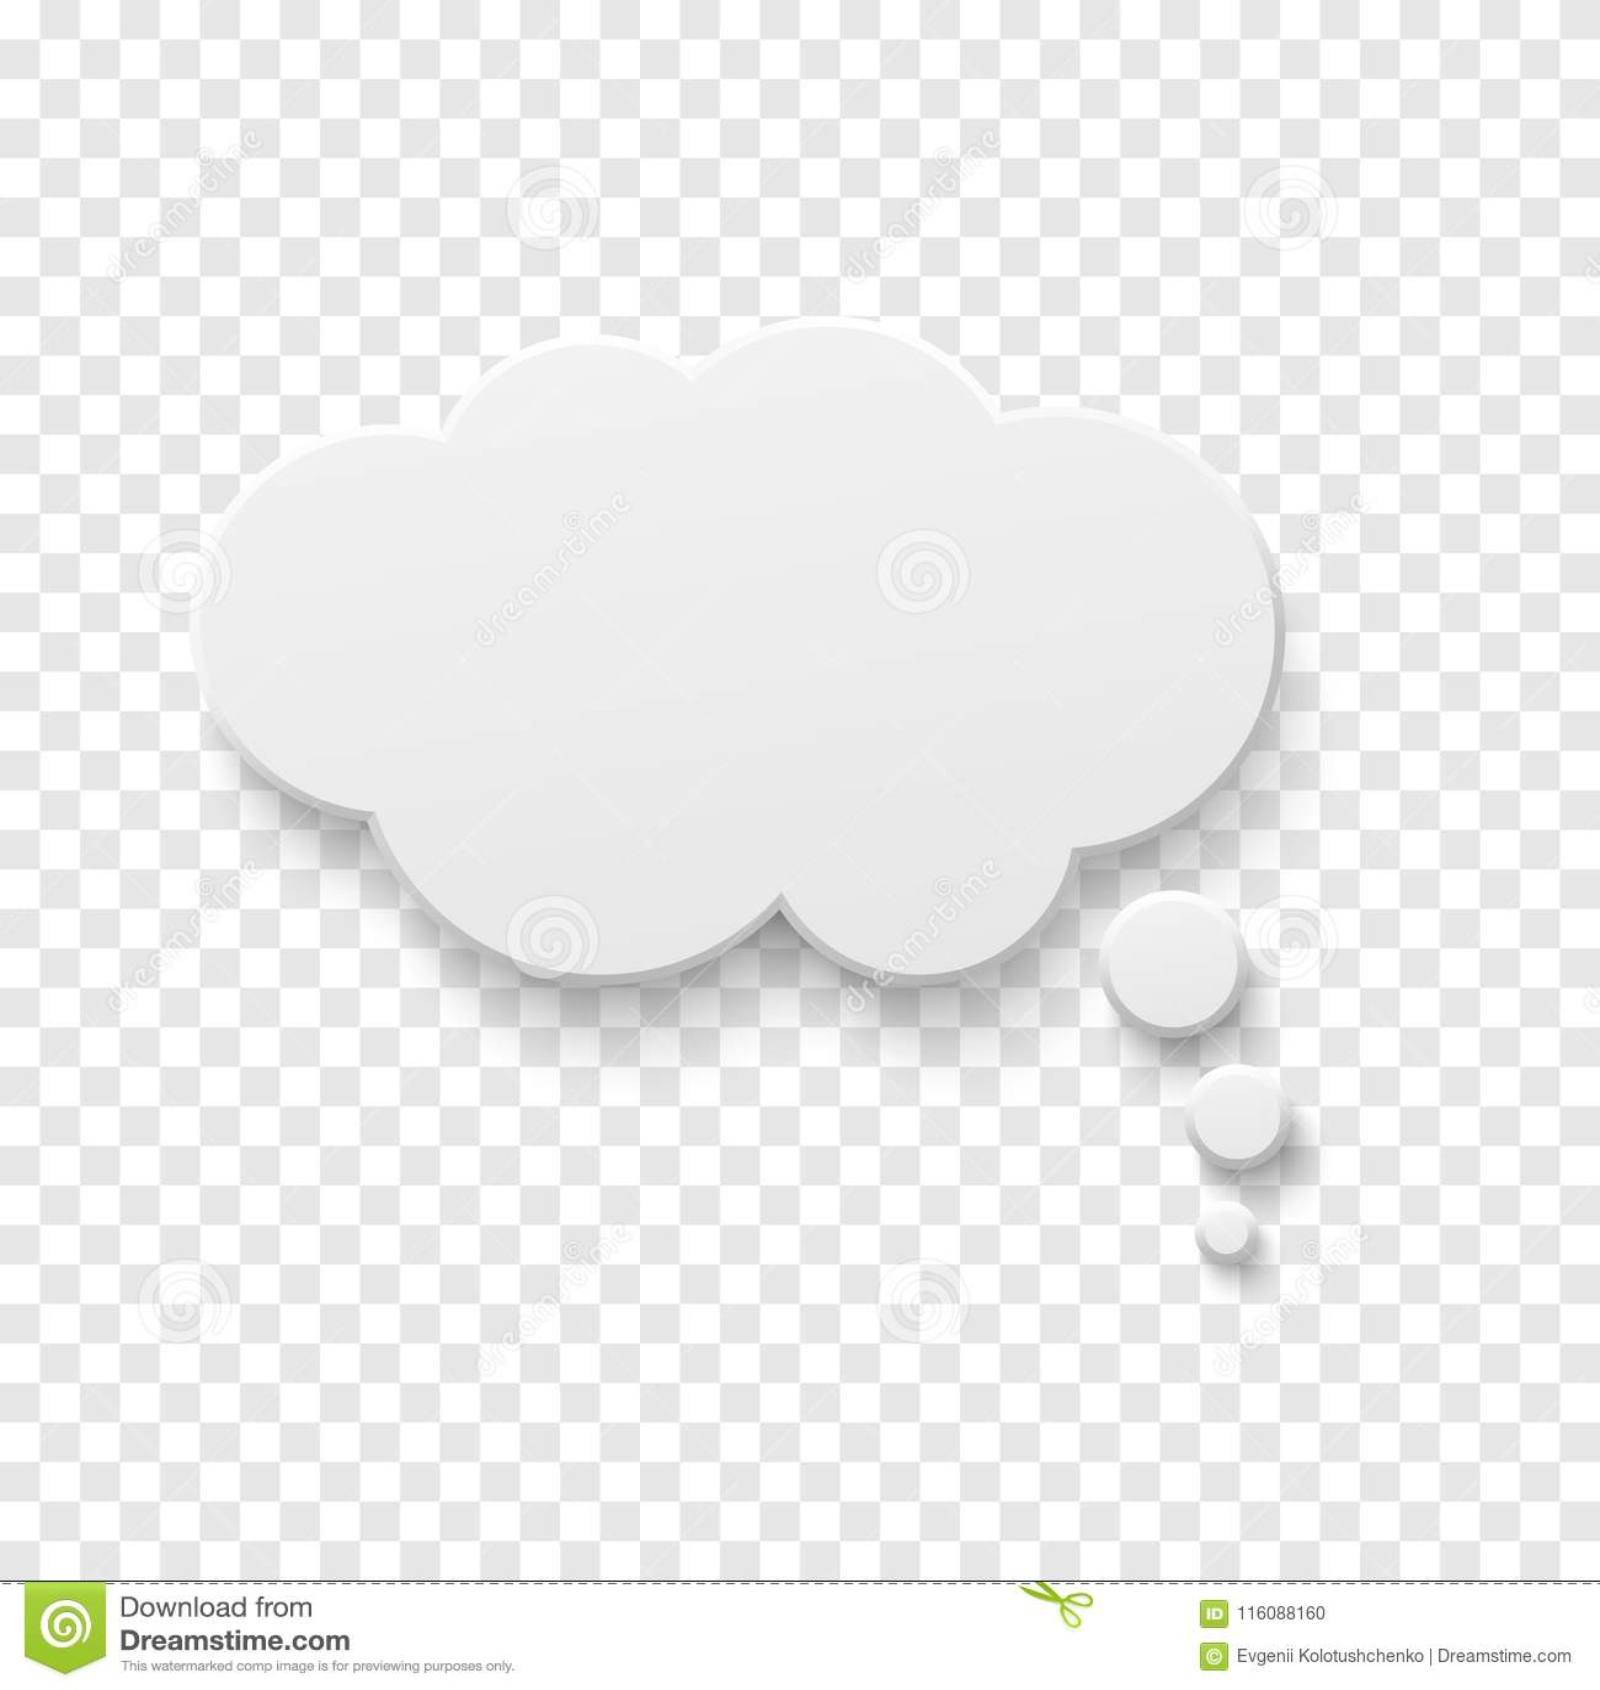 Vector White 3d Speech Bubble Concept Royalty-Free Stock